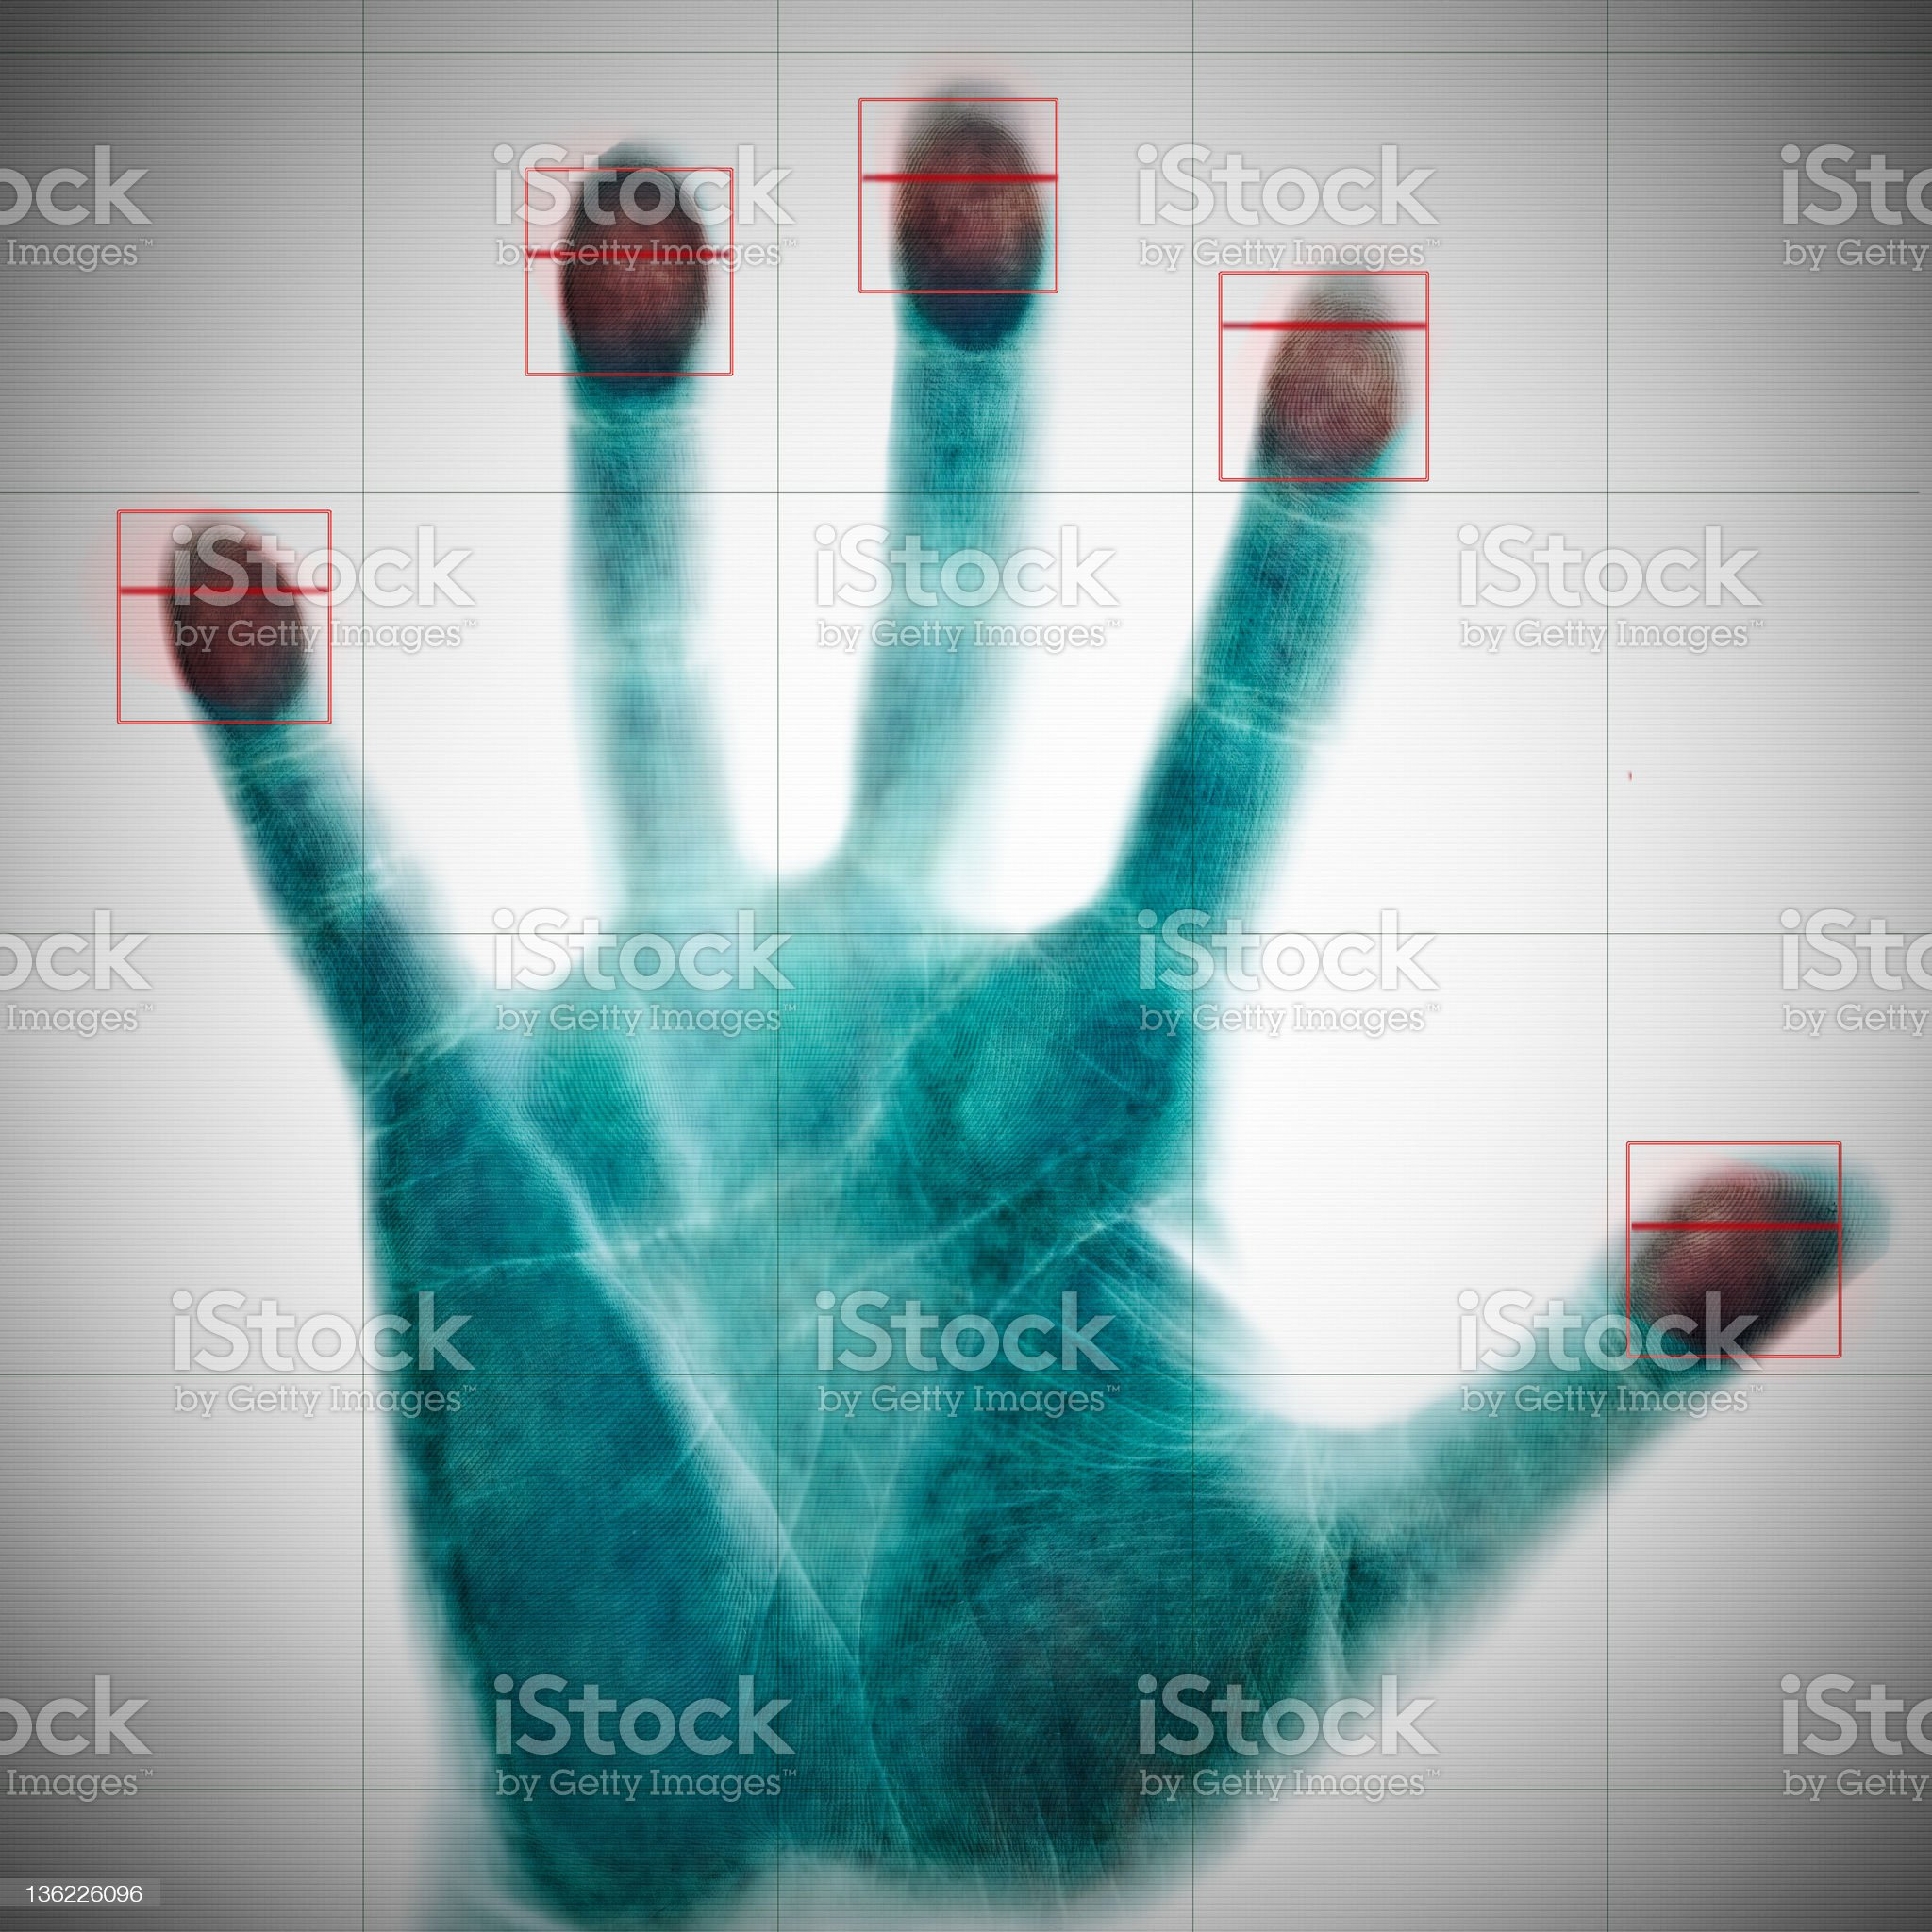 scanning of fingerprints royalty-free stock photo